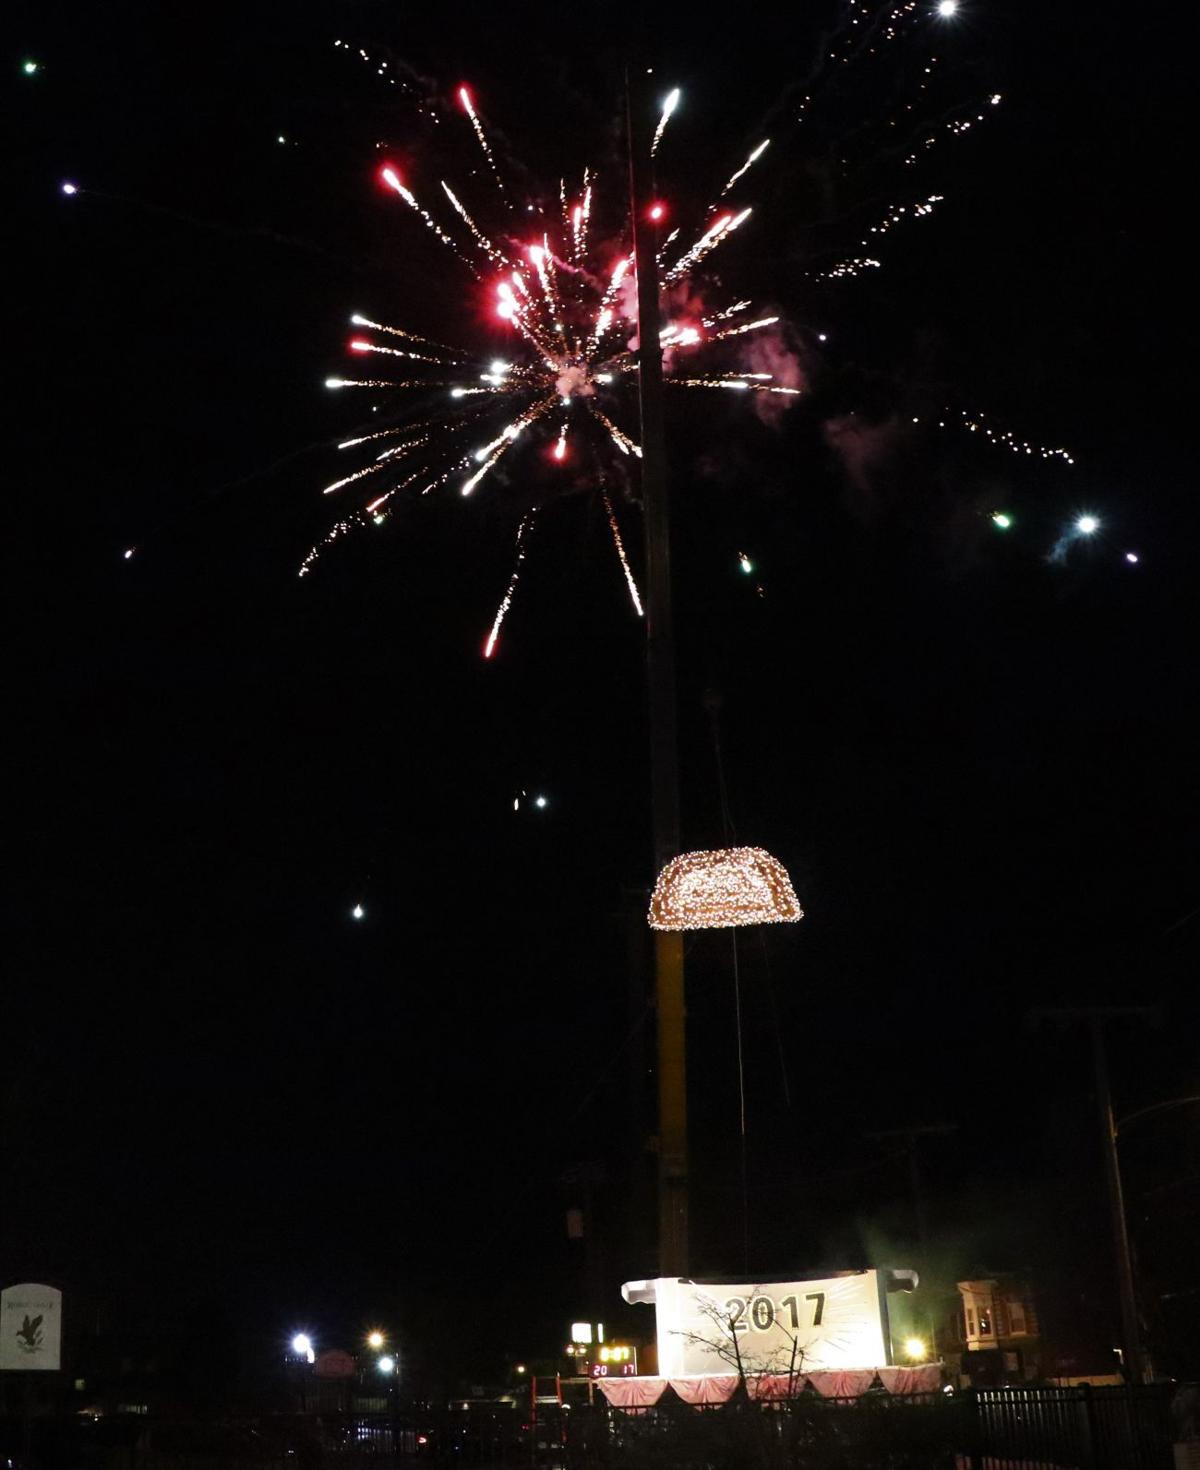 Whiting kicks off new year with pierogi drop